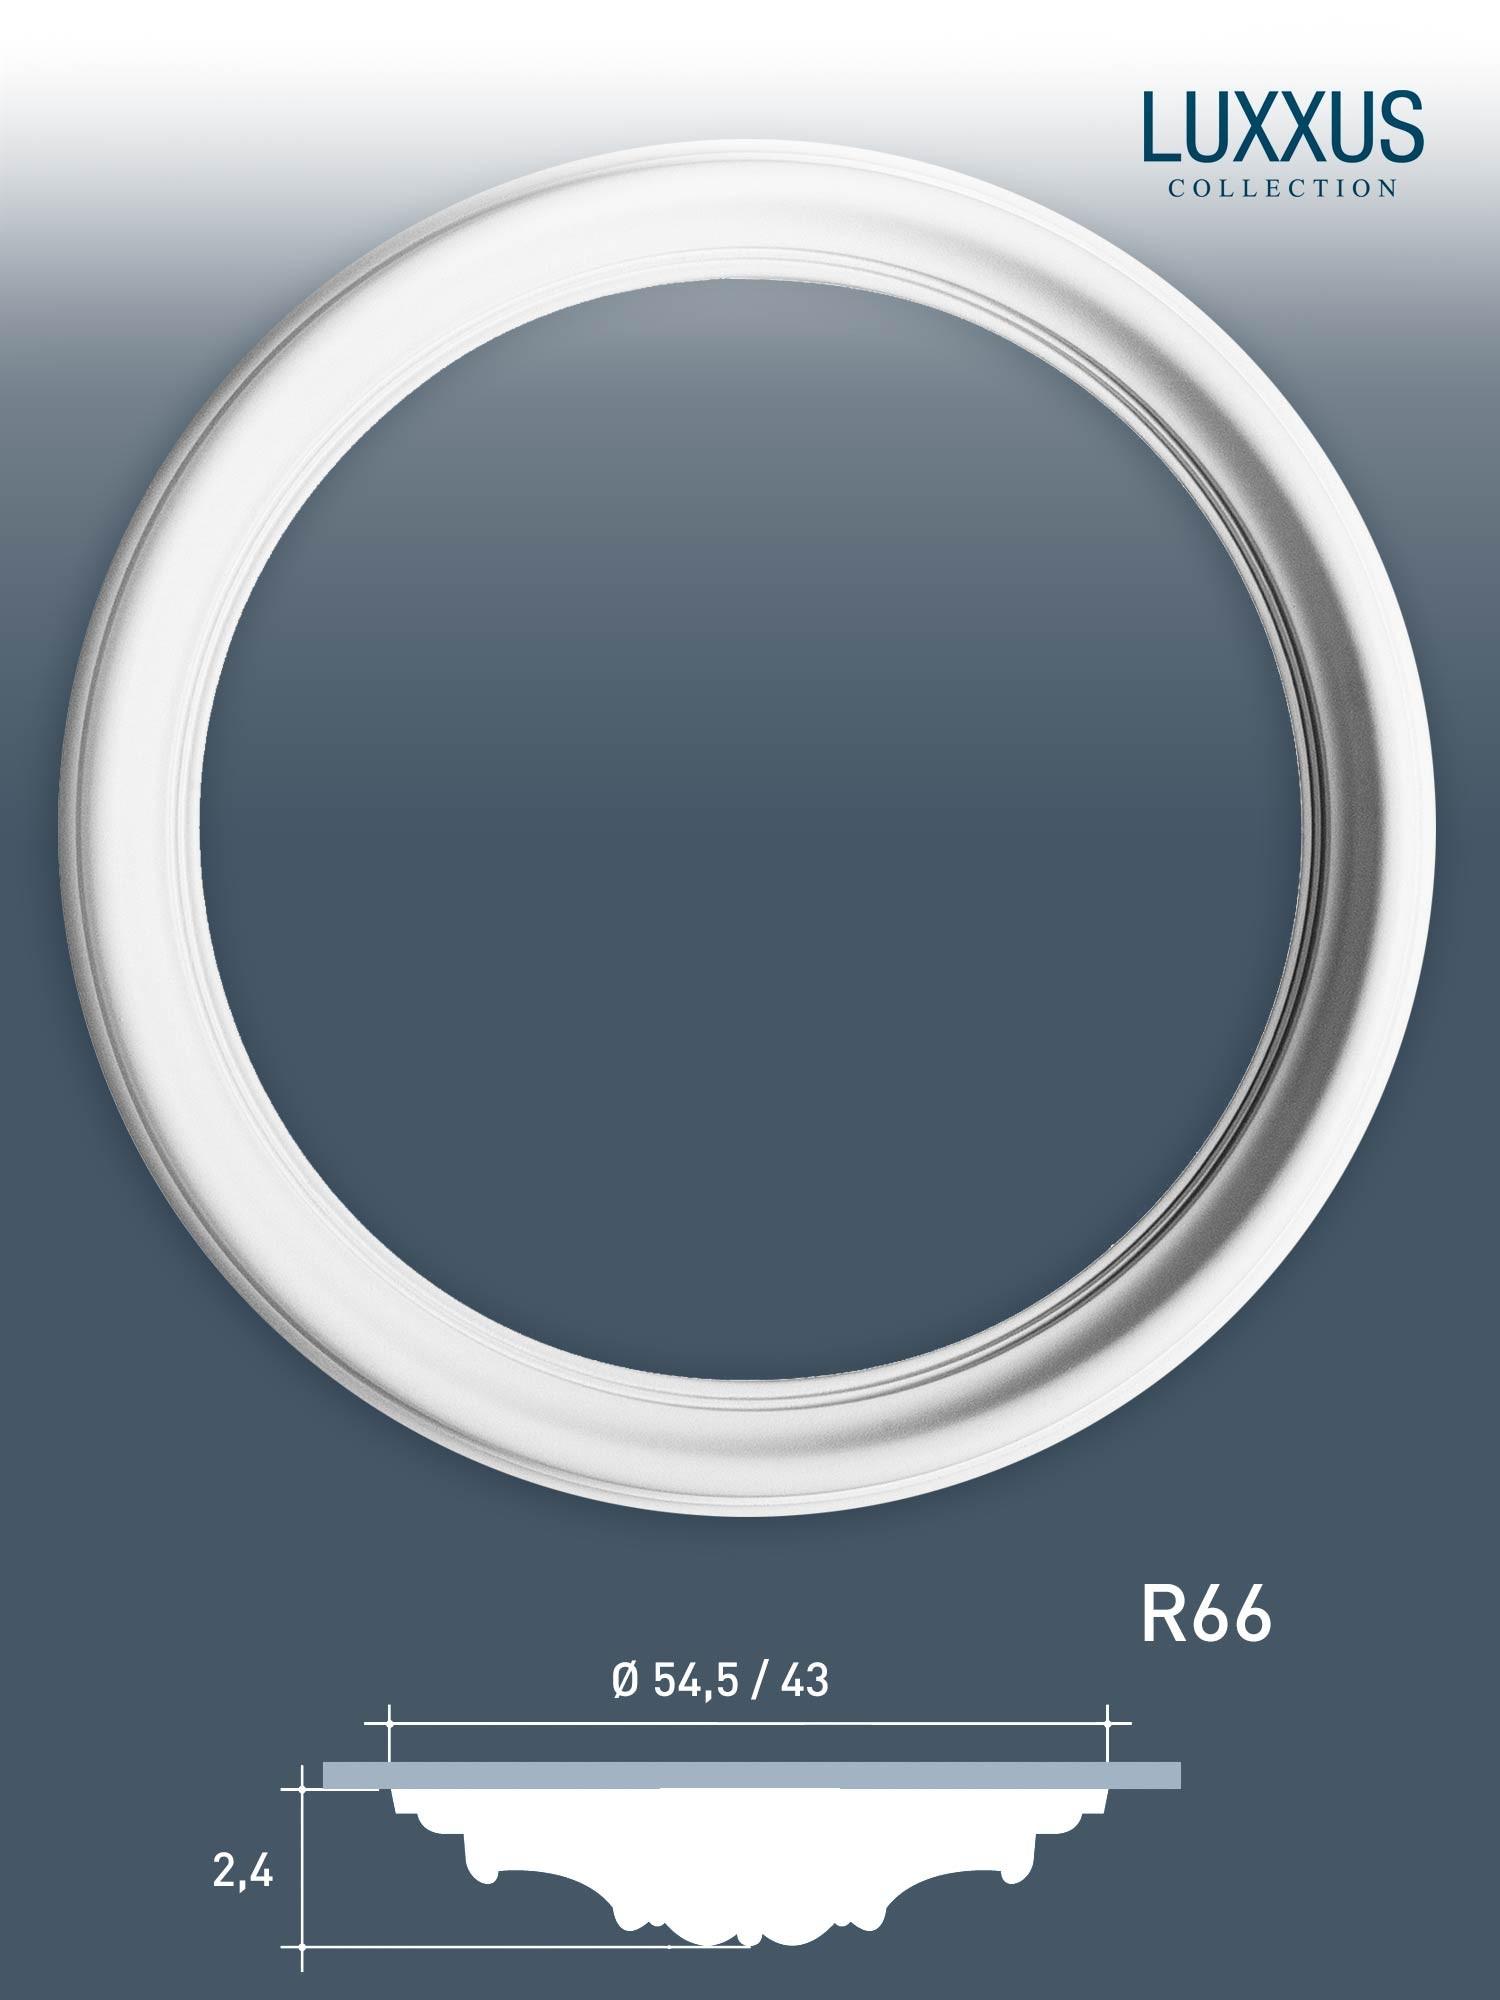 orac decor r66 luxxus hochwertige ring decken rosette stuck lampen rosette 54 cm ebay. Black Bedroom Furniture Sets. Home Design Ideas